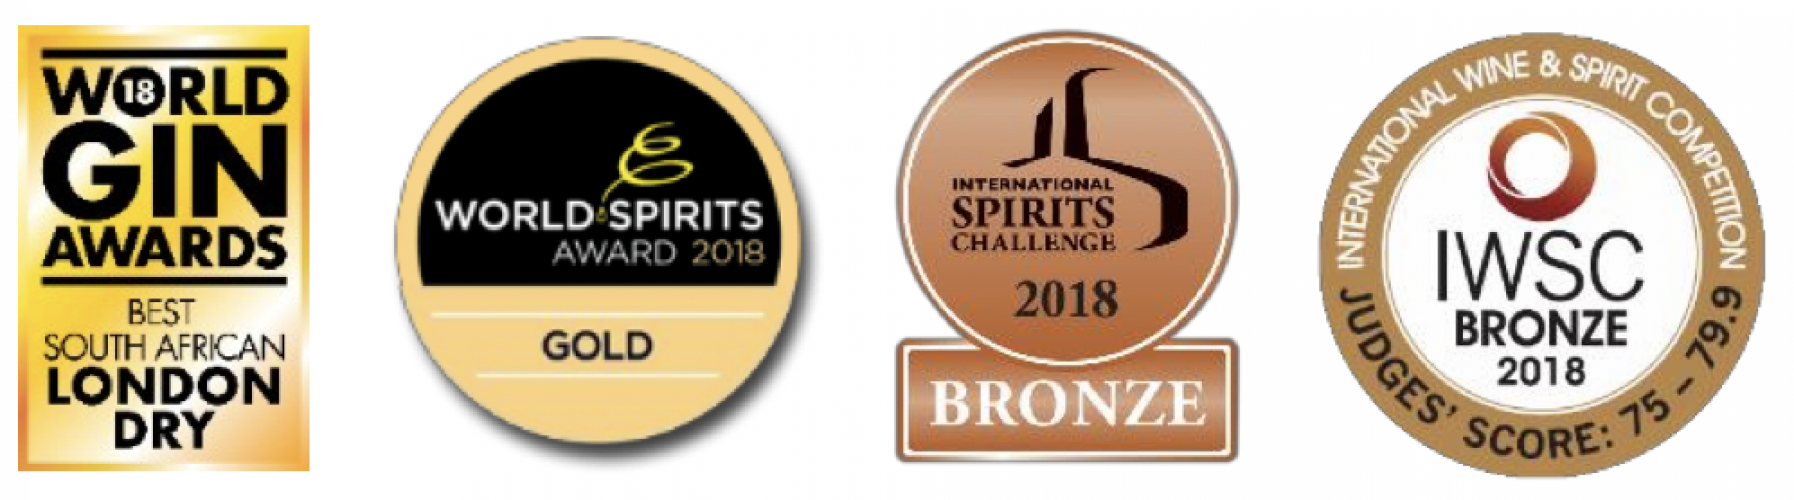 KWV Cruxland琴酒 awards